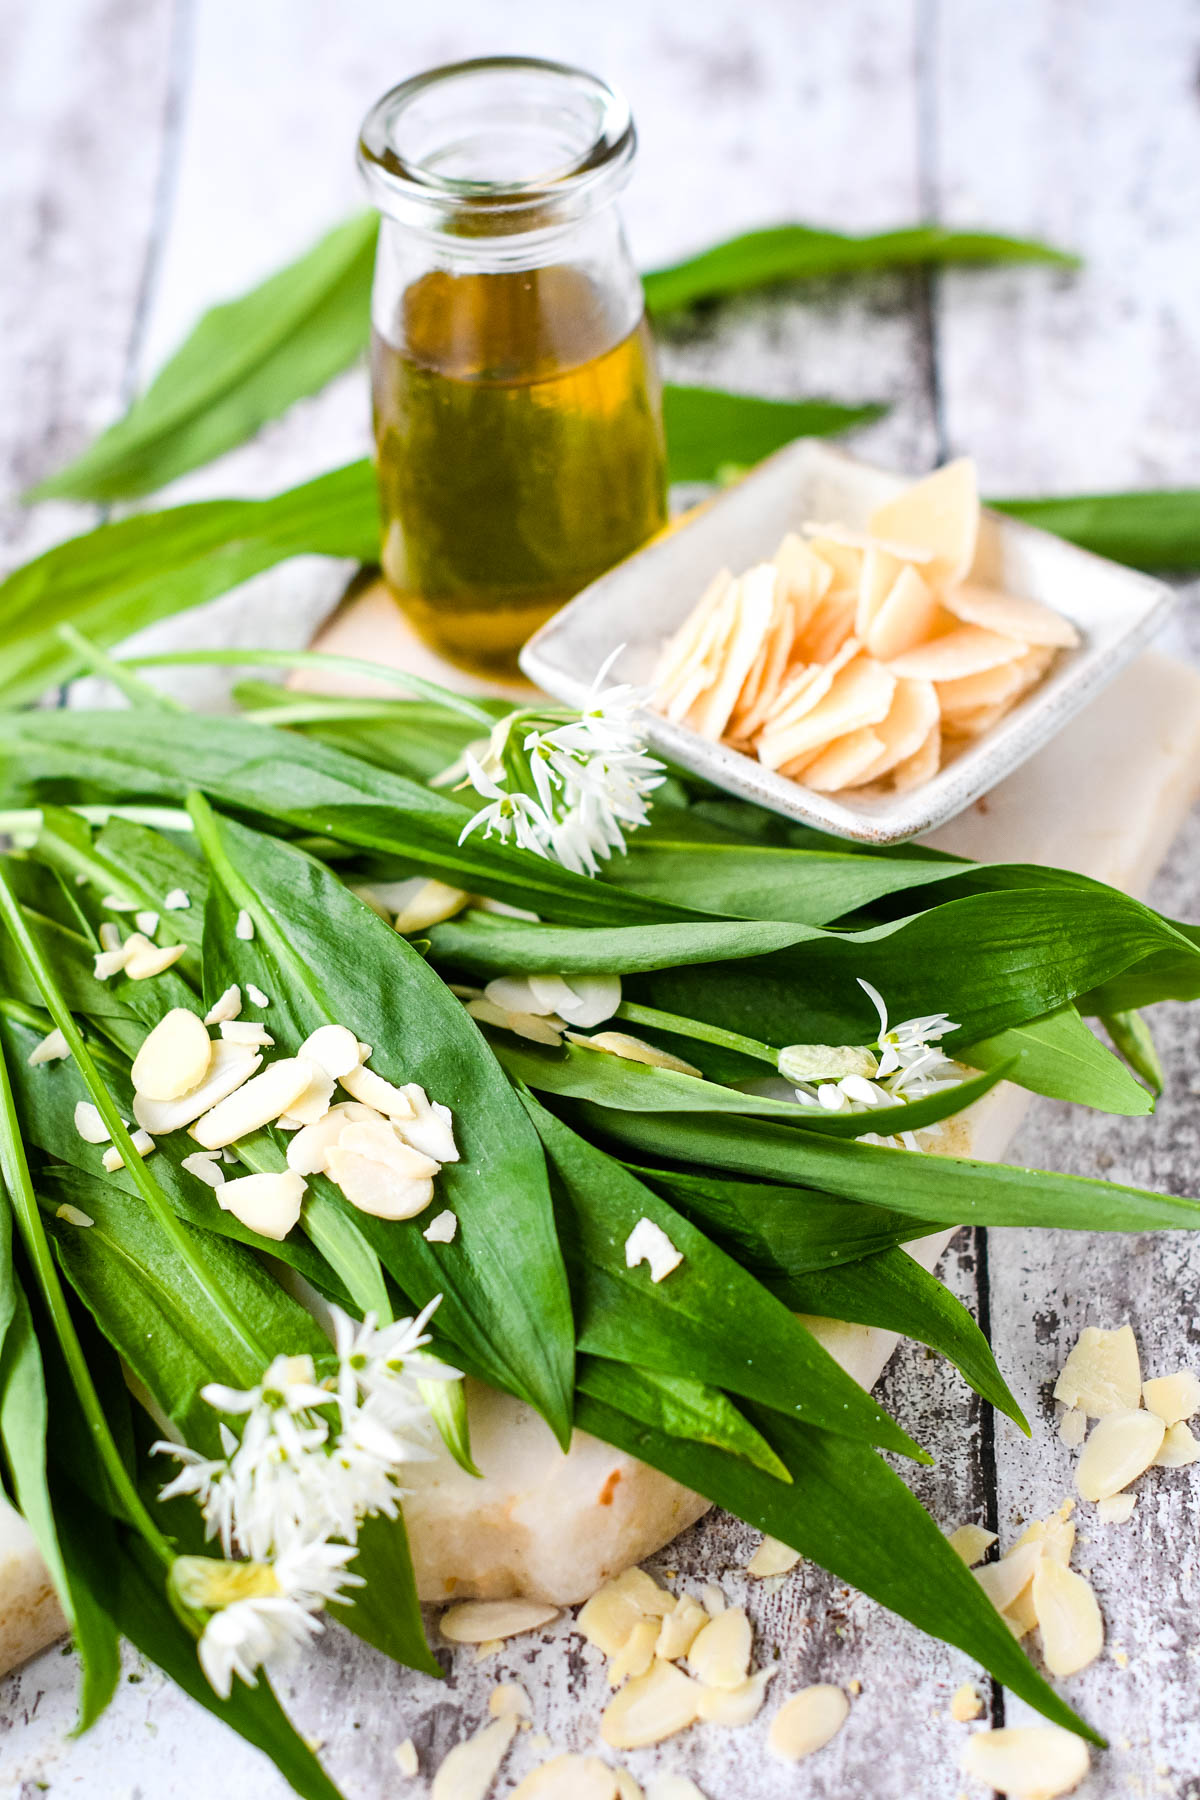 ingredients; wild garlic, parmesan, olive oil and almonds